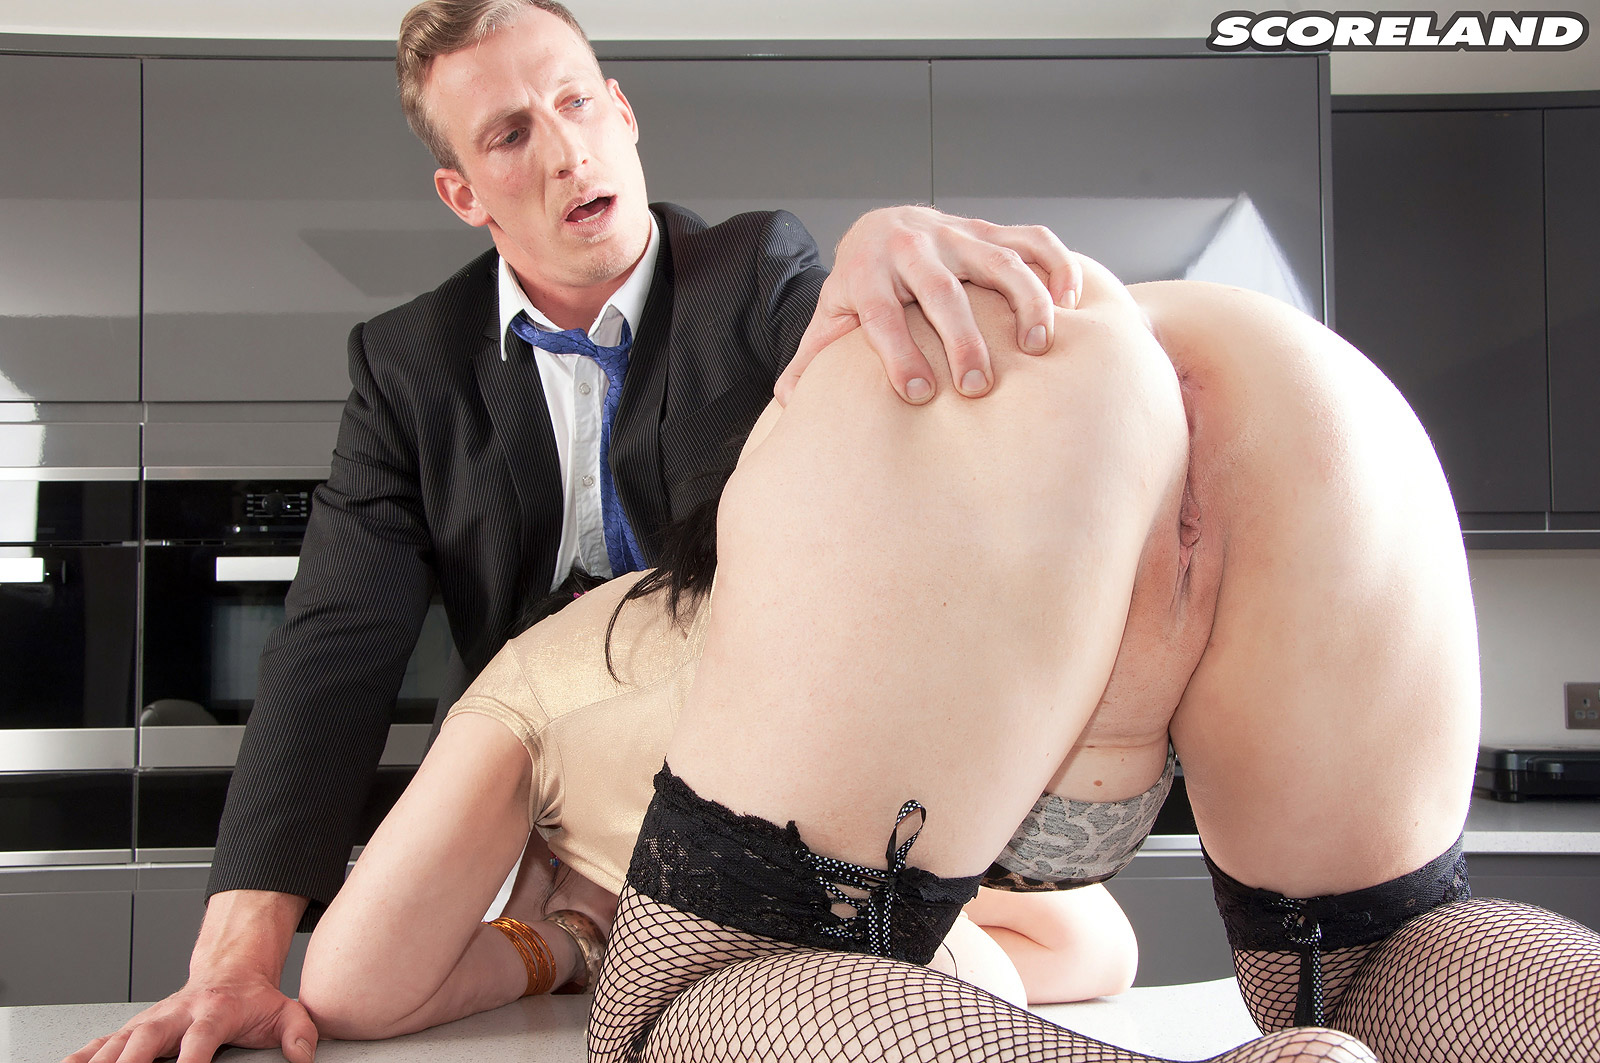 Sabrina-Jade - Big Tit Inspector - Scoreland 117802-1430